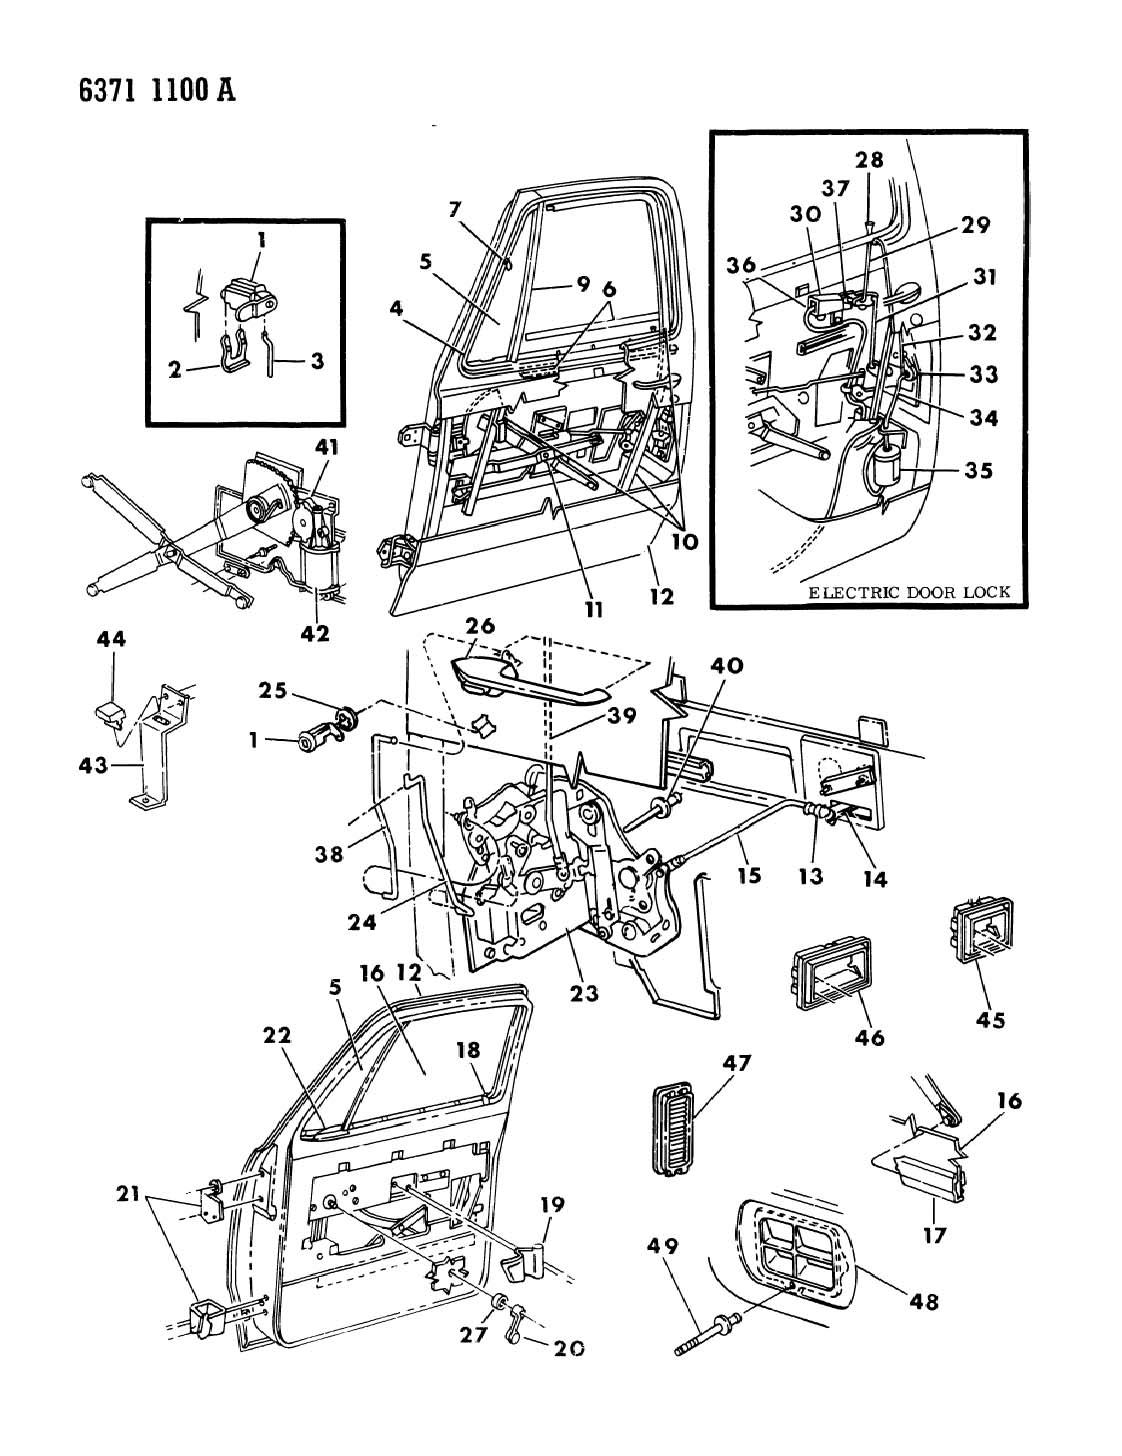 2008 dodge avenger belt diagram 1964 impala wiring wiper besides